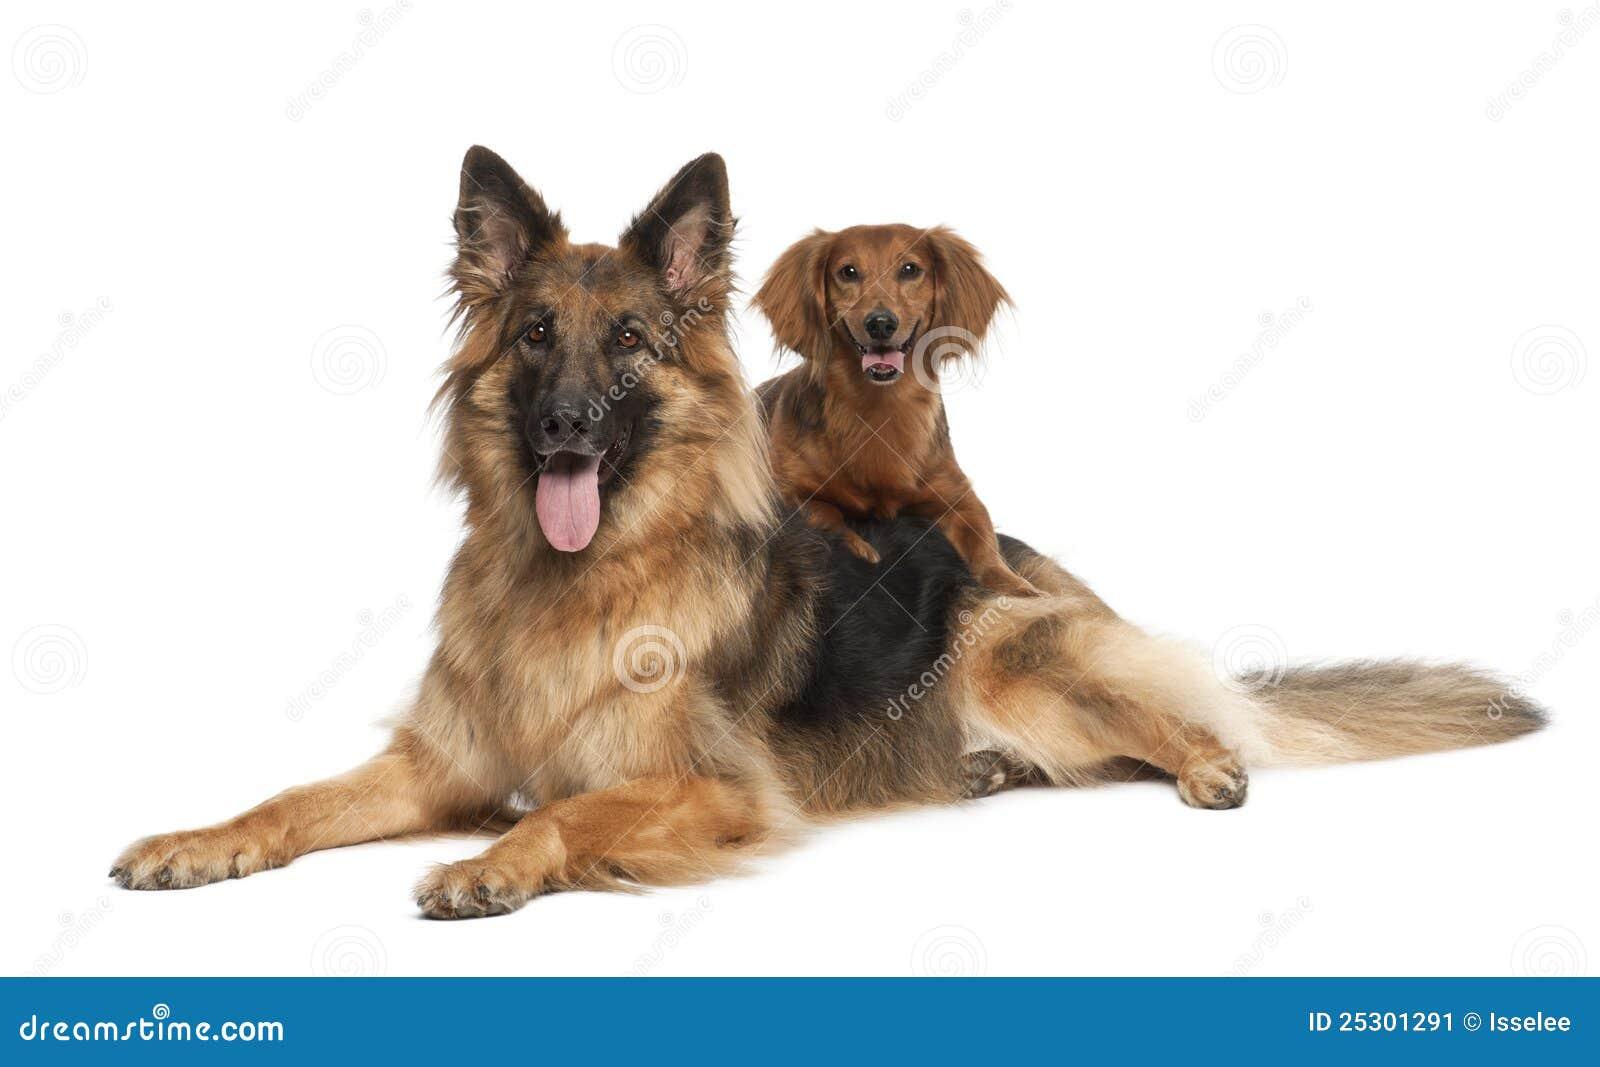 Dachshund, 9 years old, German Shepherd Dog, 3 years old, portrait ...